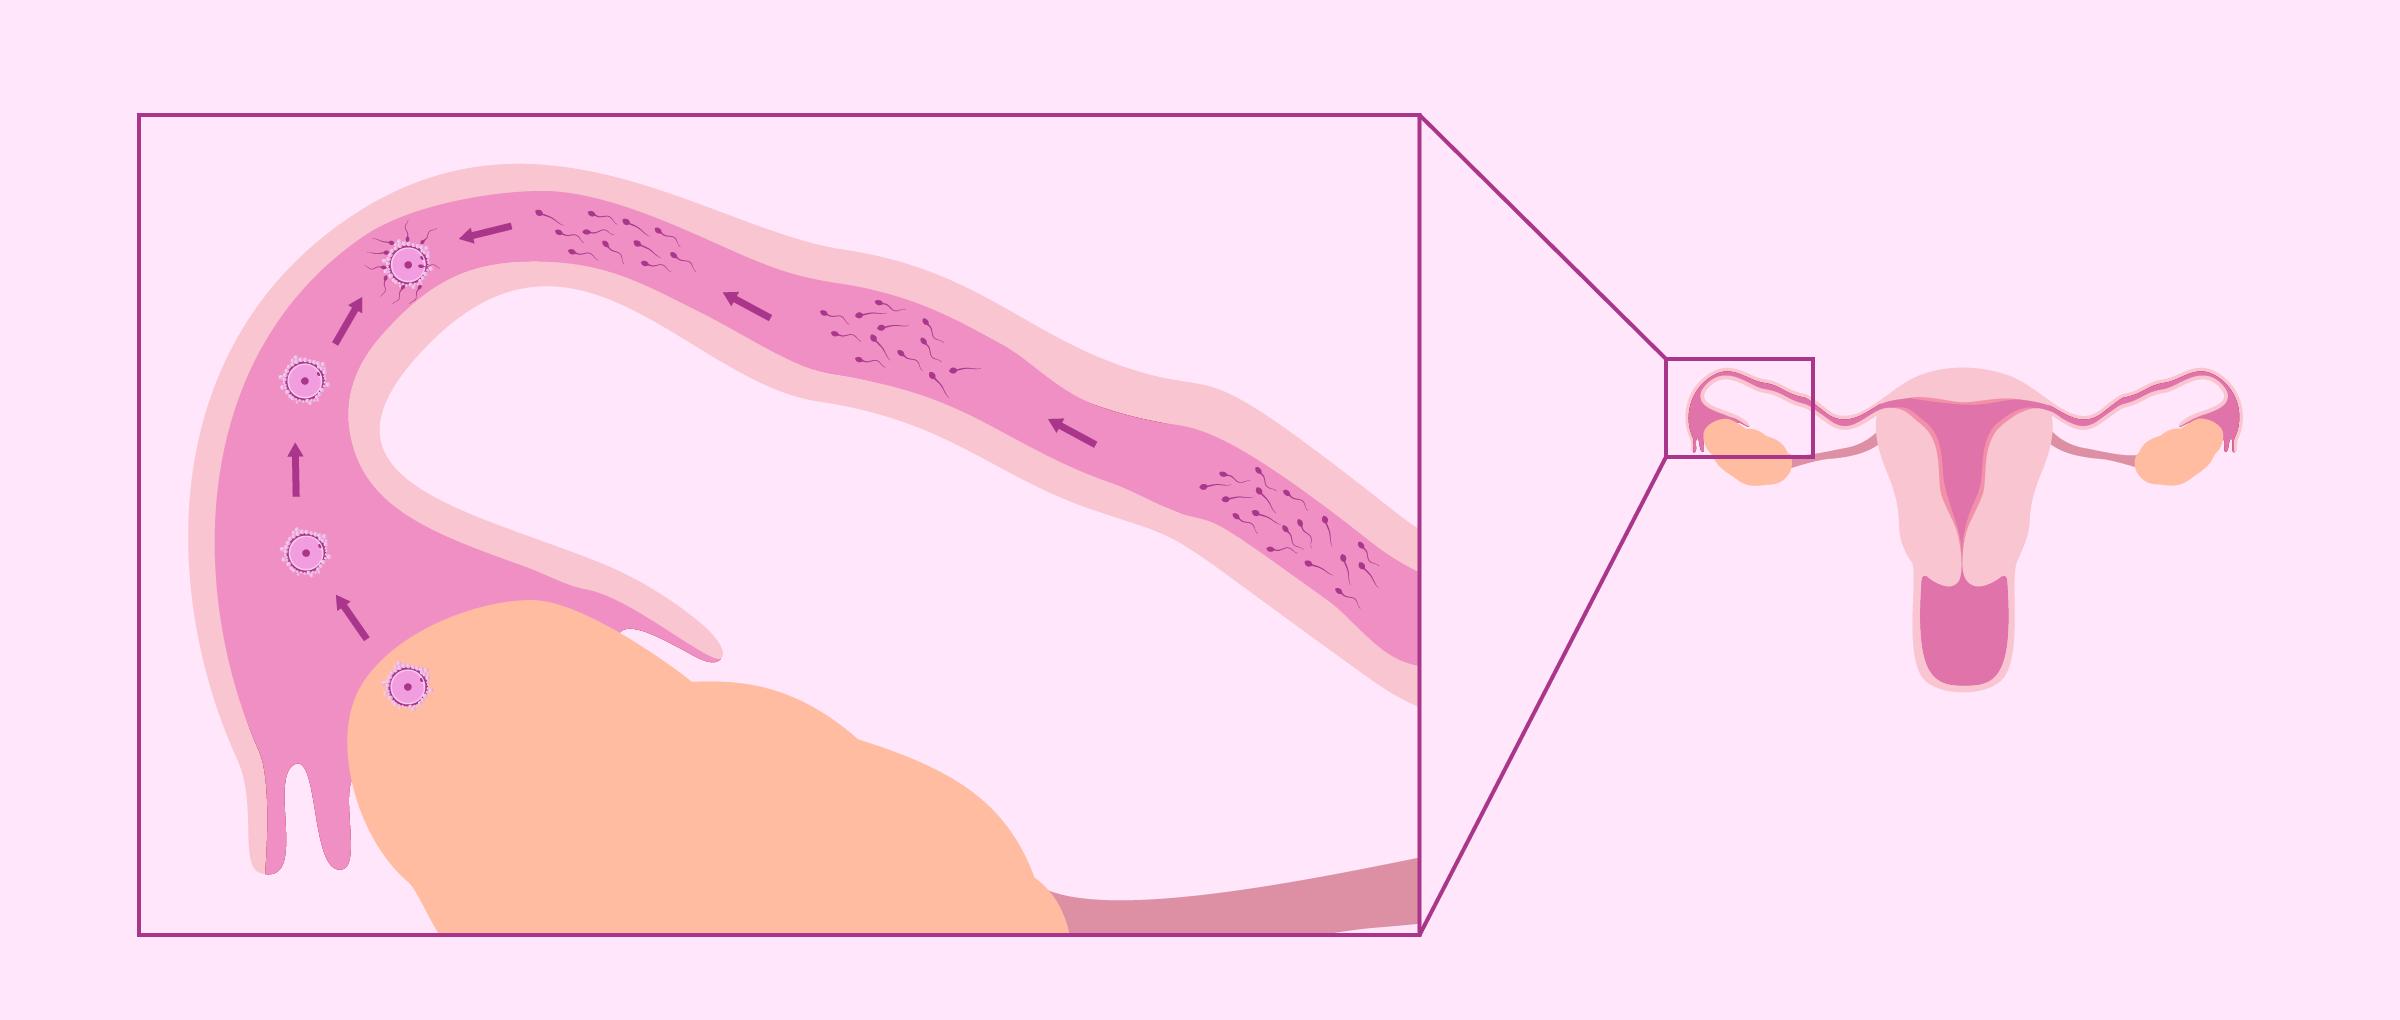 Natural fertilization in the fallopian tubes